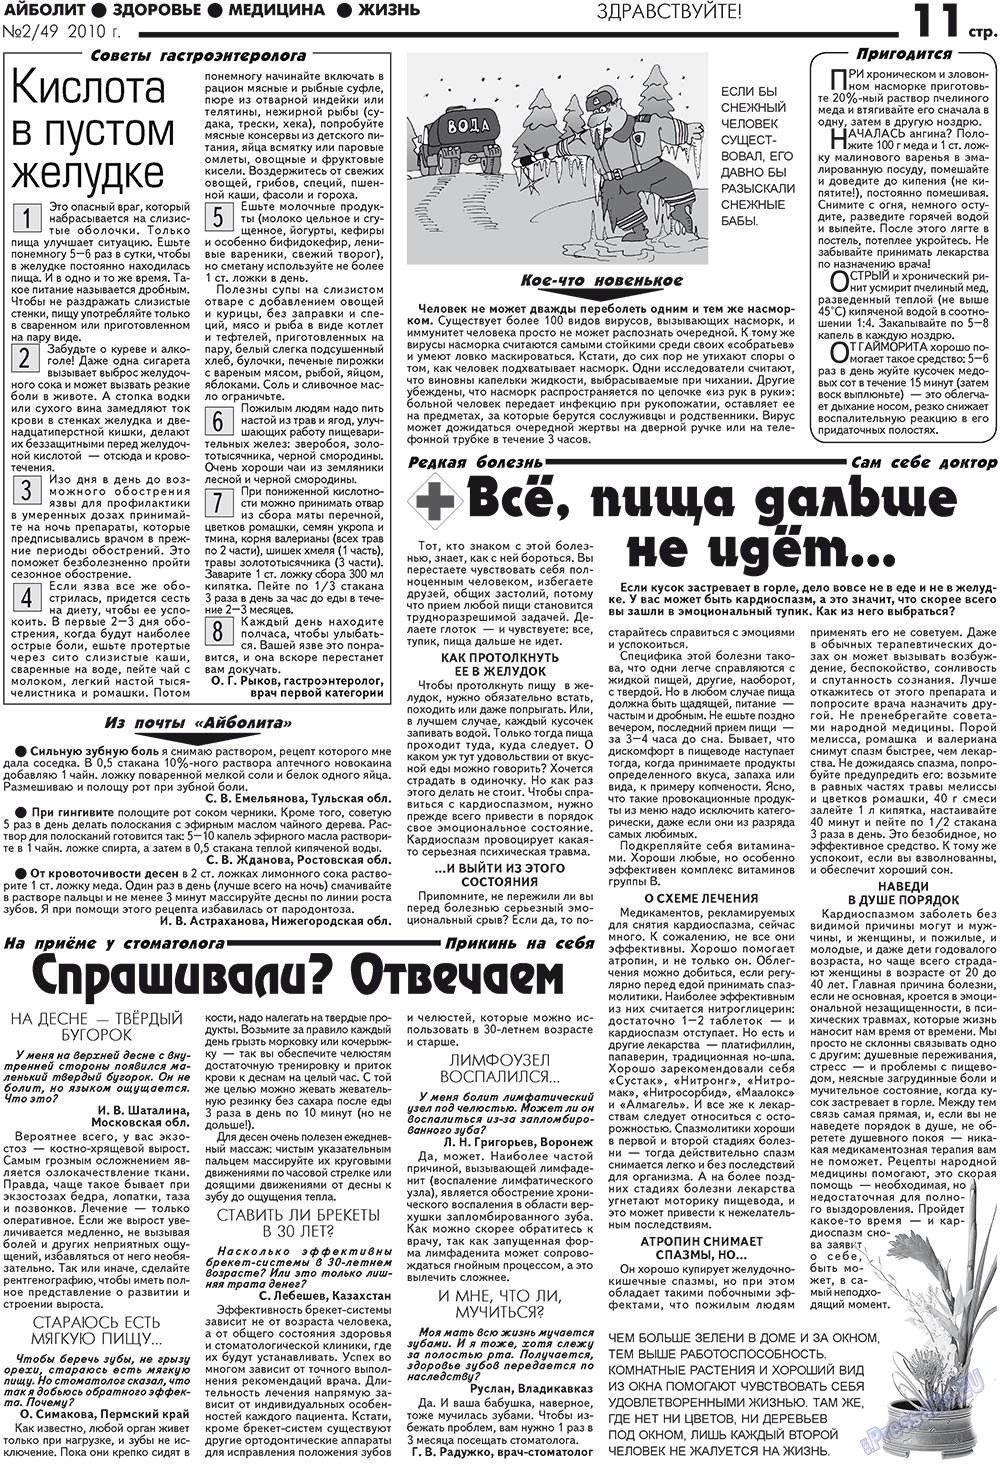 АйБолит (газета). 2010 год, номер 2, стр. 11